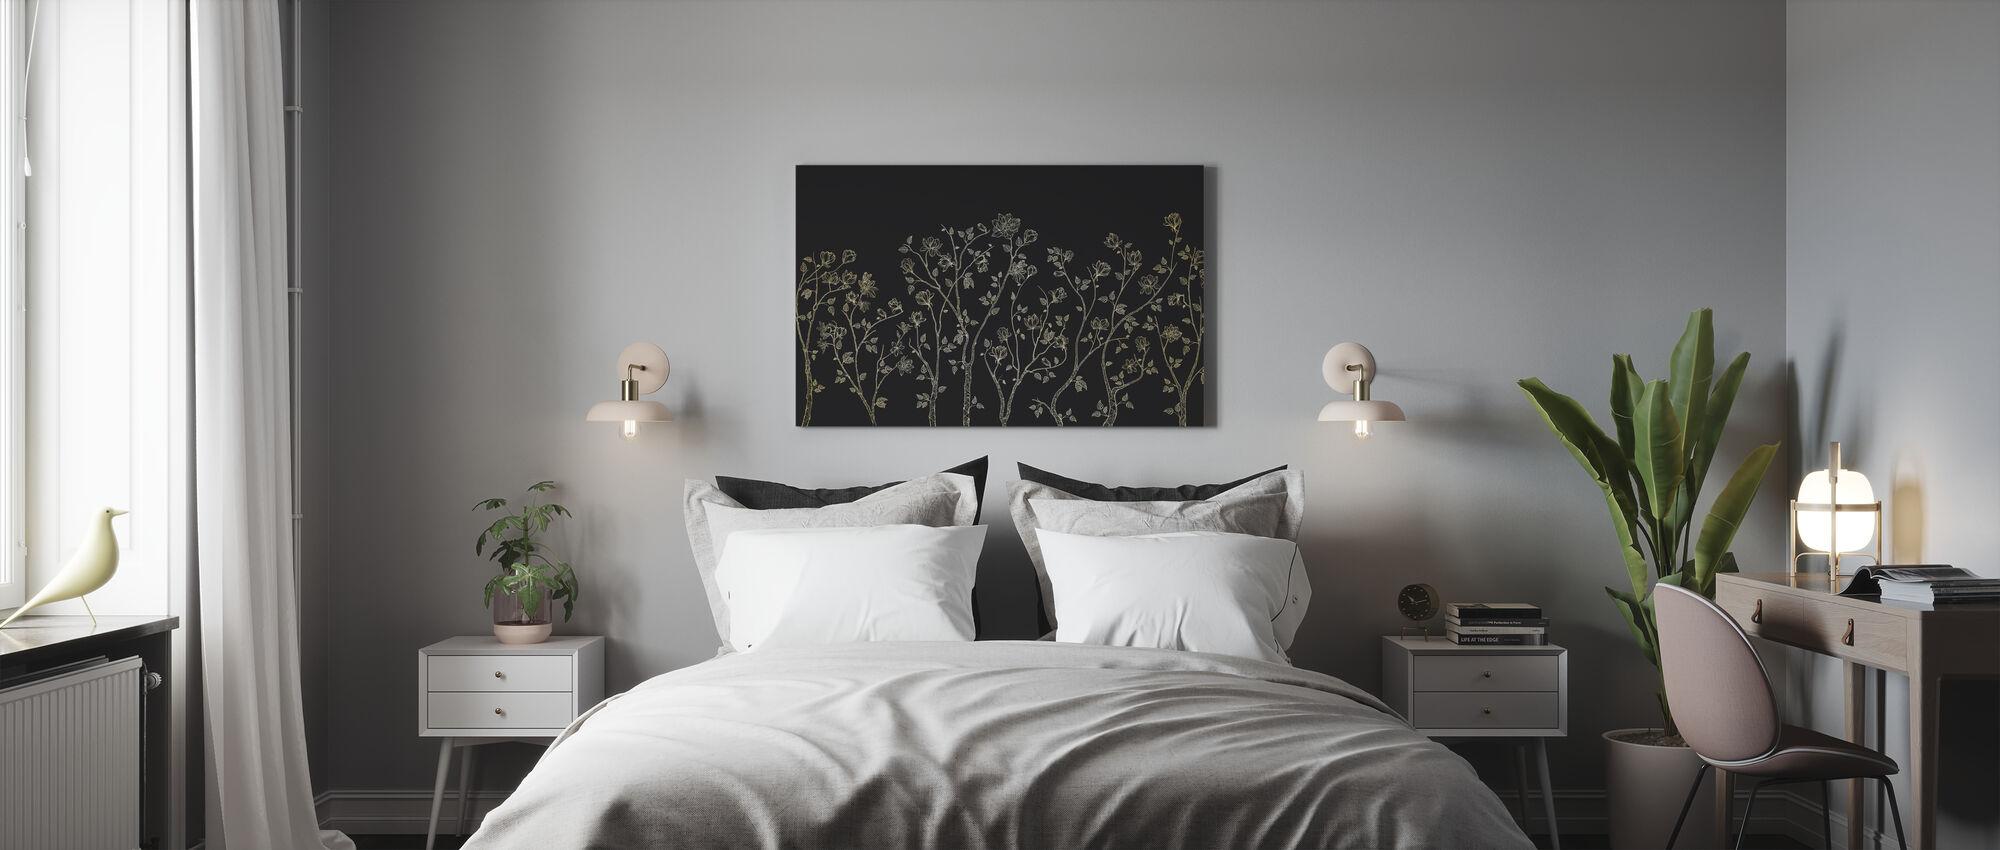 Crescent Vegetative - Dark Grey - Canvas print - Bedroom